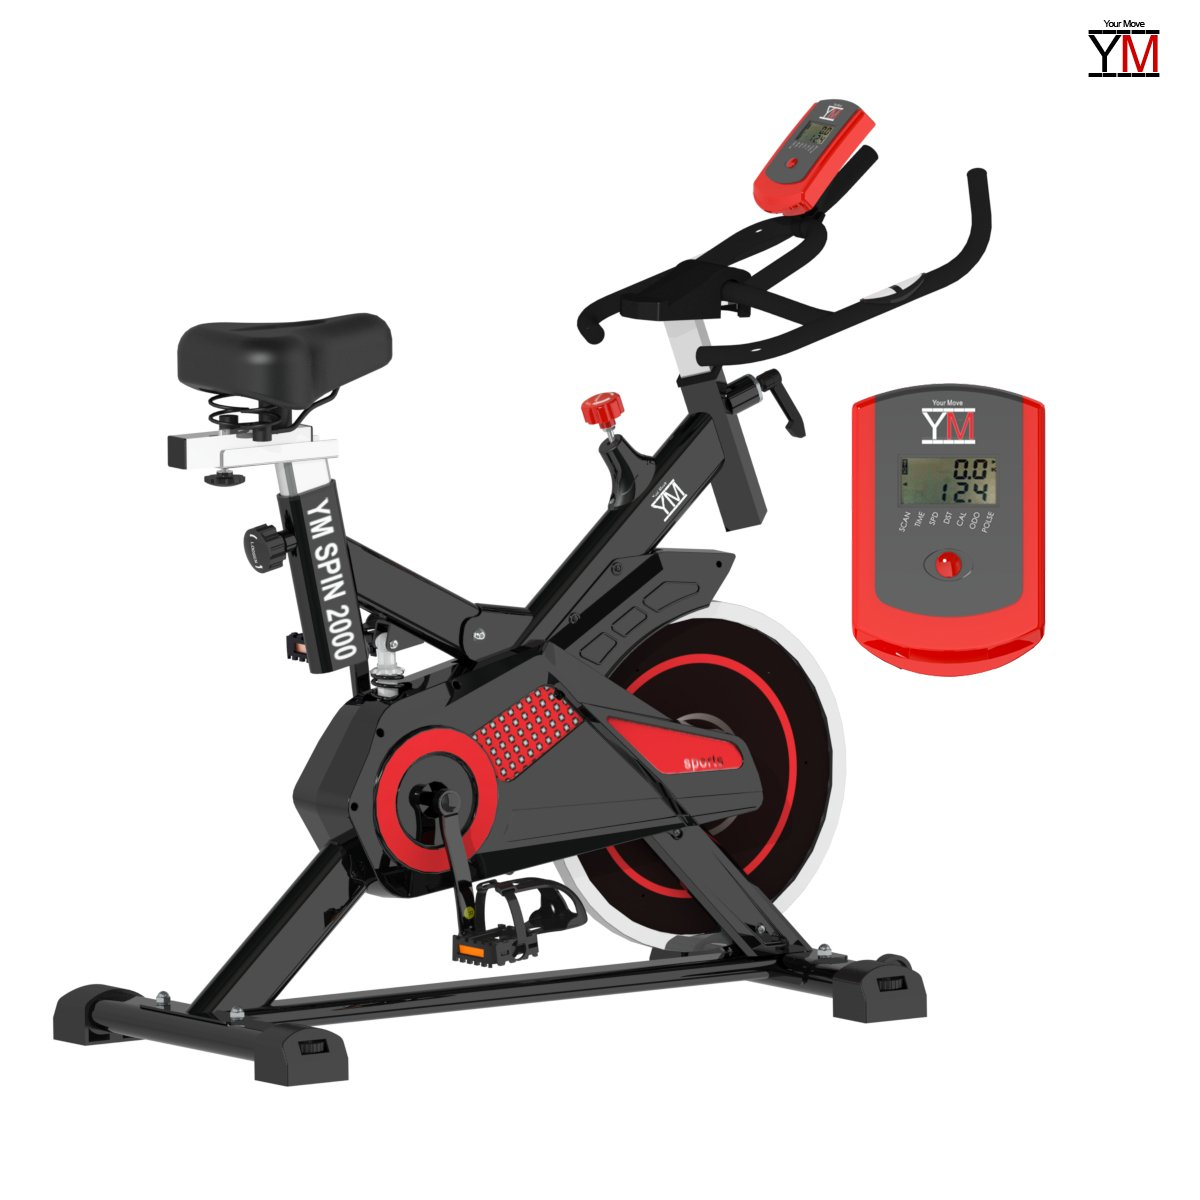 Bicicleta de spinning - Bike Your Move Cardio, bicicleta estática ...